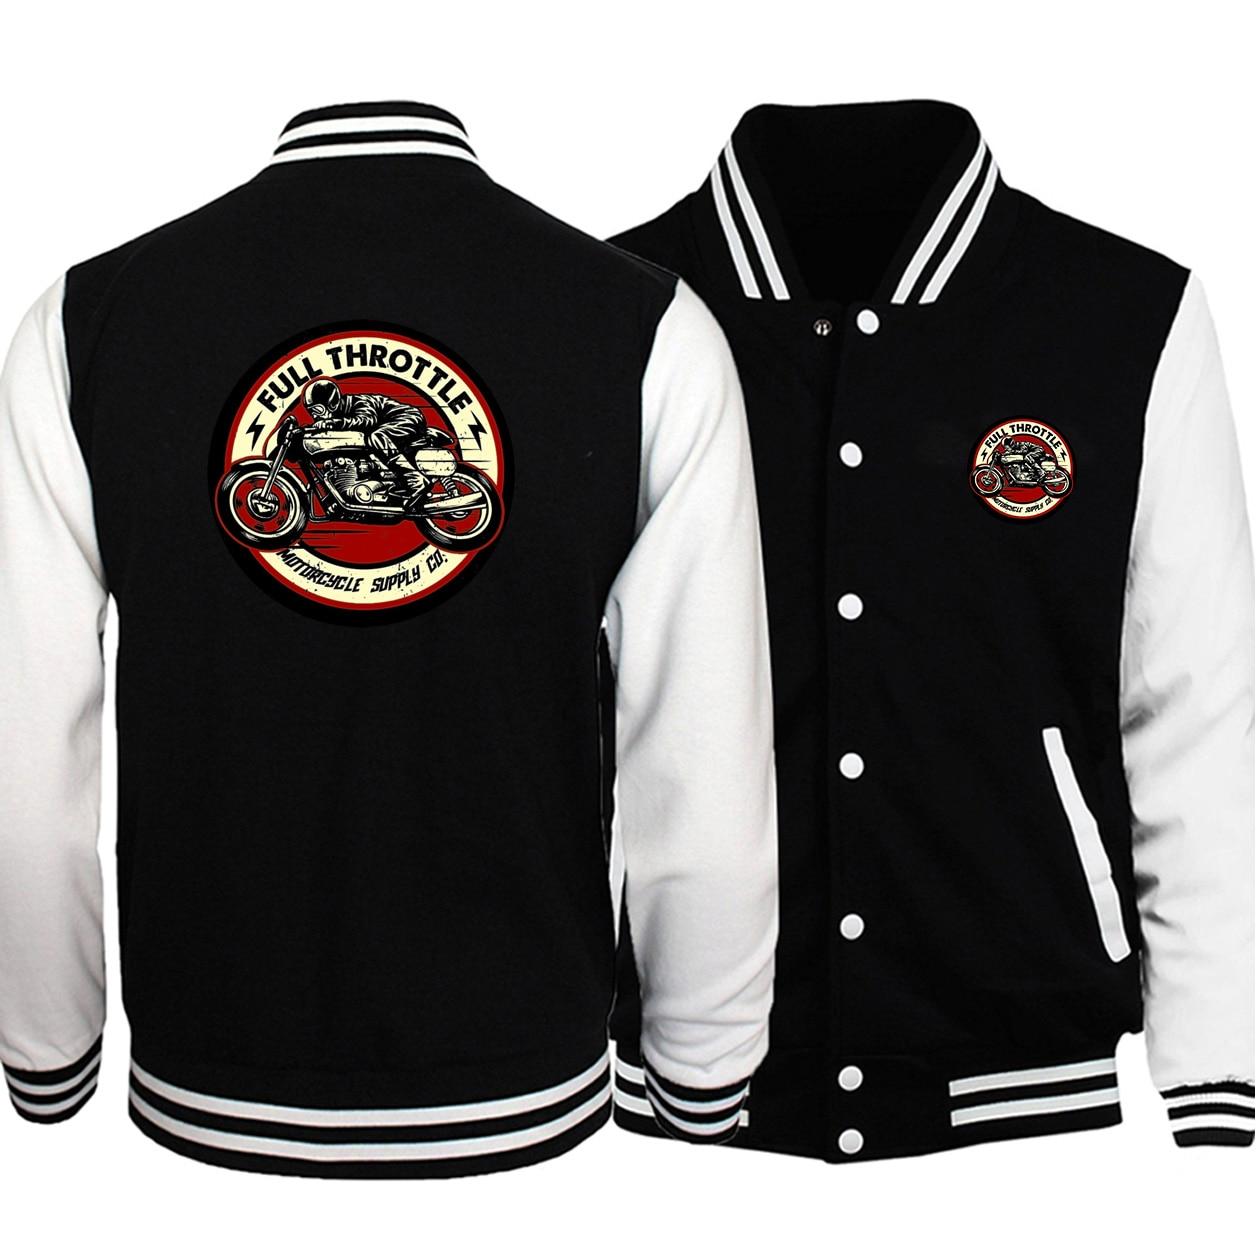 Full Throttle Cafe Racer Rockabilly Biker Baseball Uniform Men Coats Autumn Fleece Warm White Black Bomber Jacket Streetwear